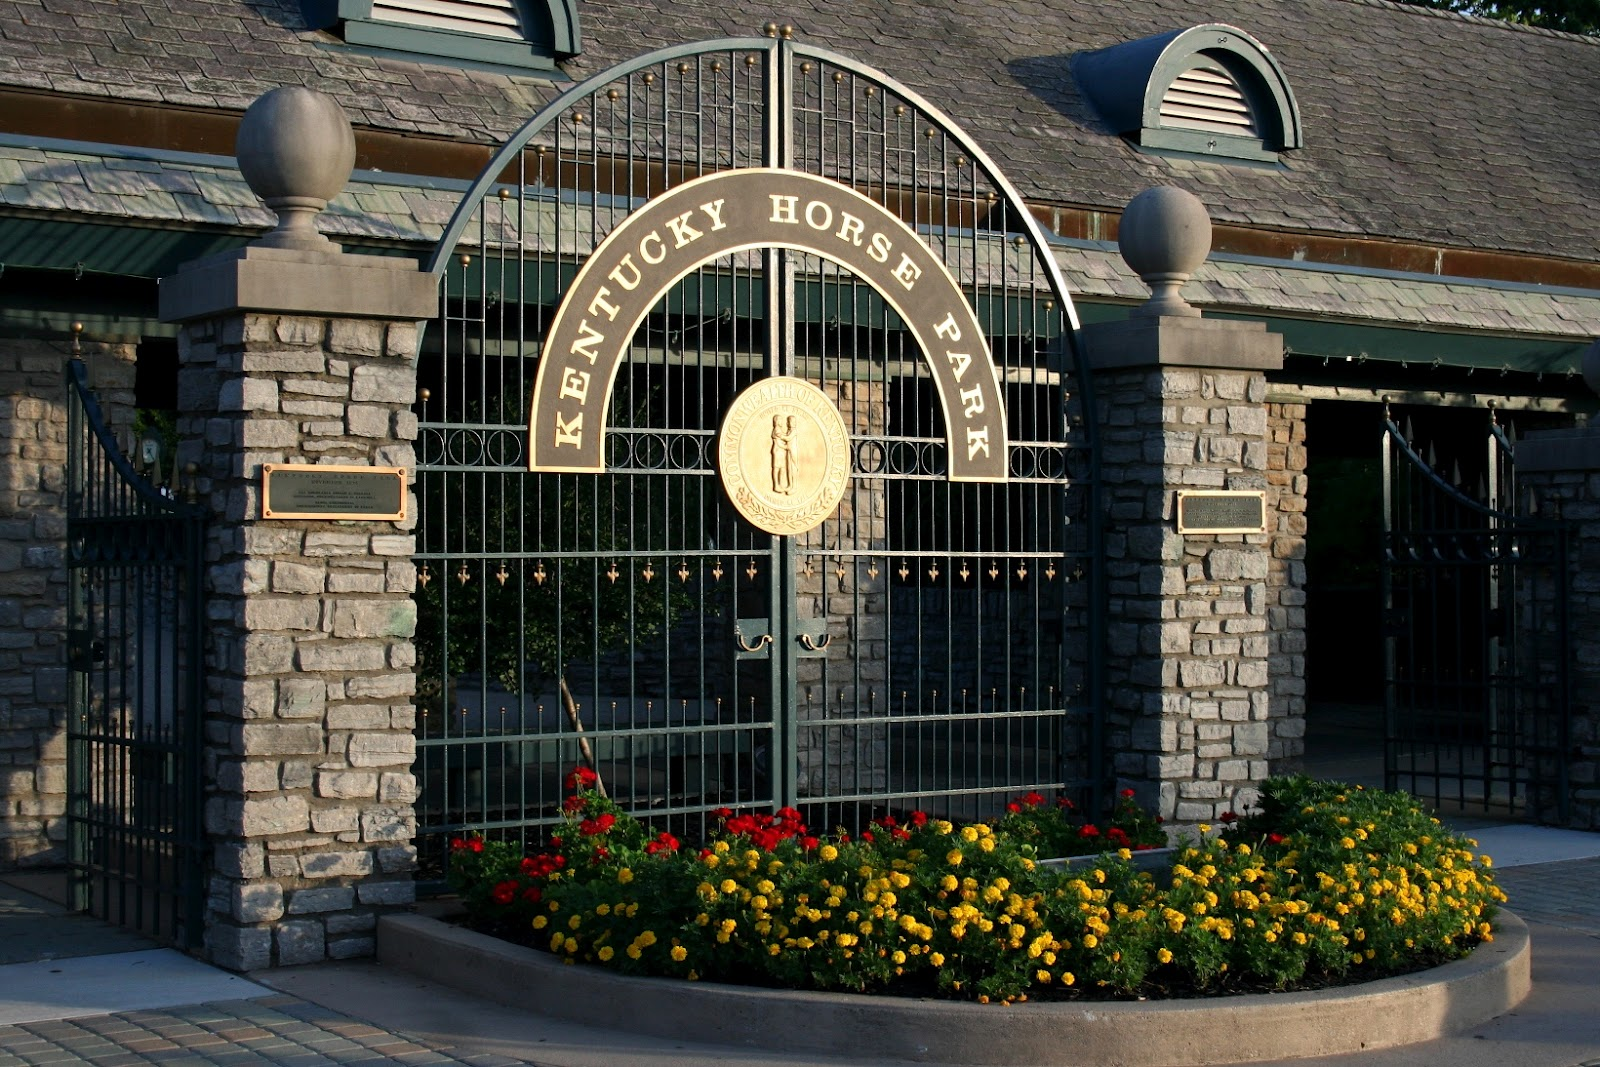 Knight's Tale Studio: Breyerfest and Kentucky Horse Park Tips on